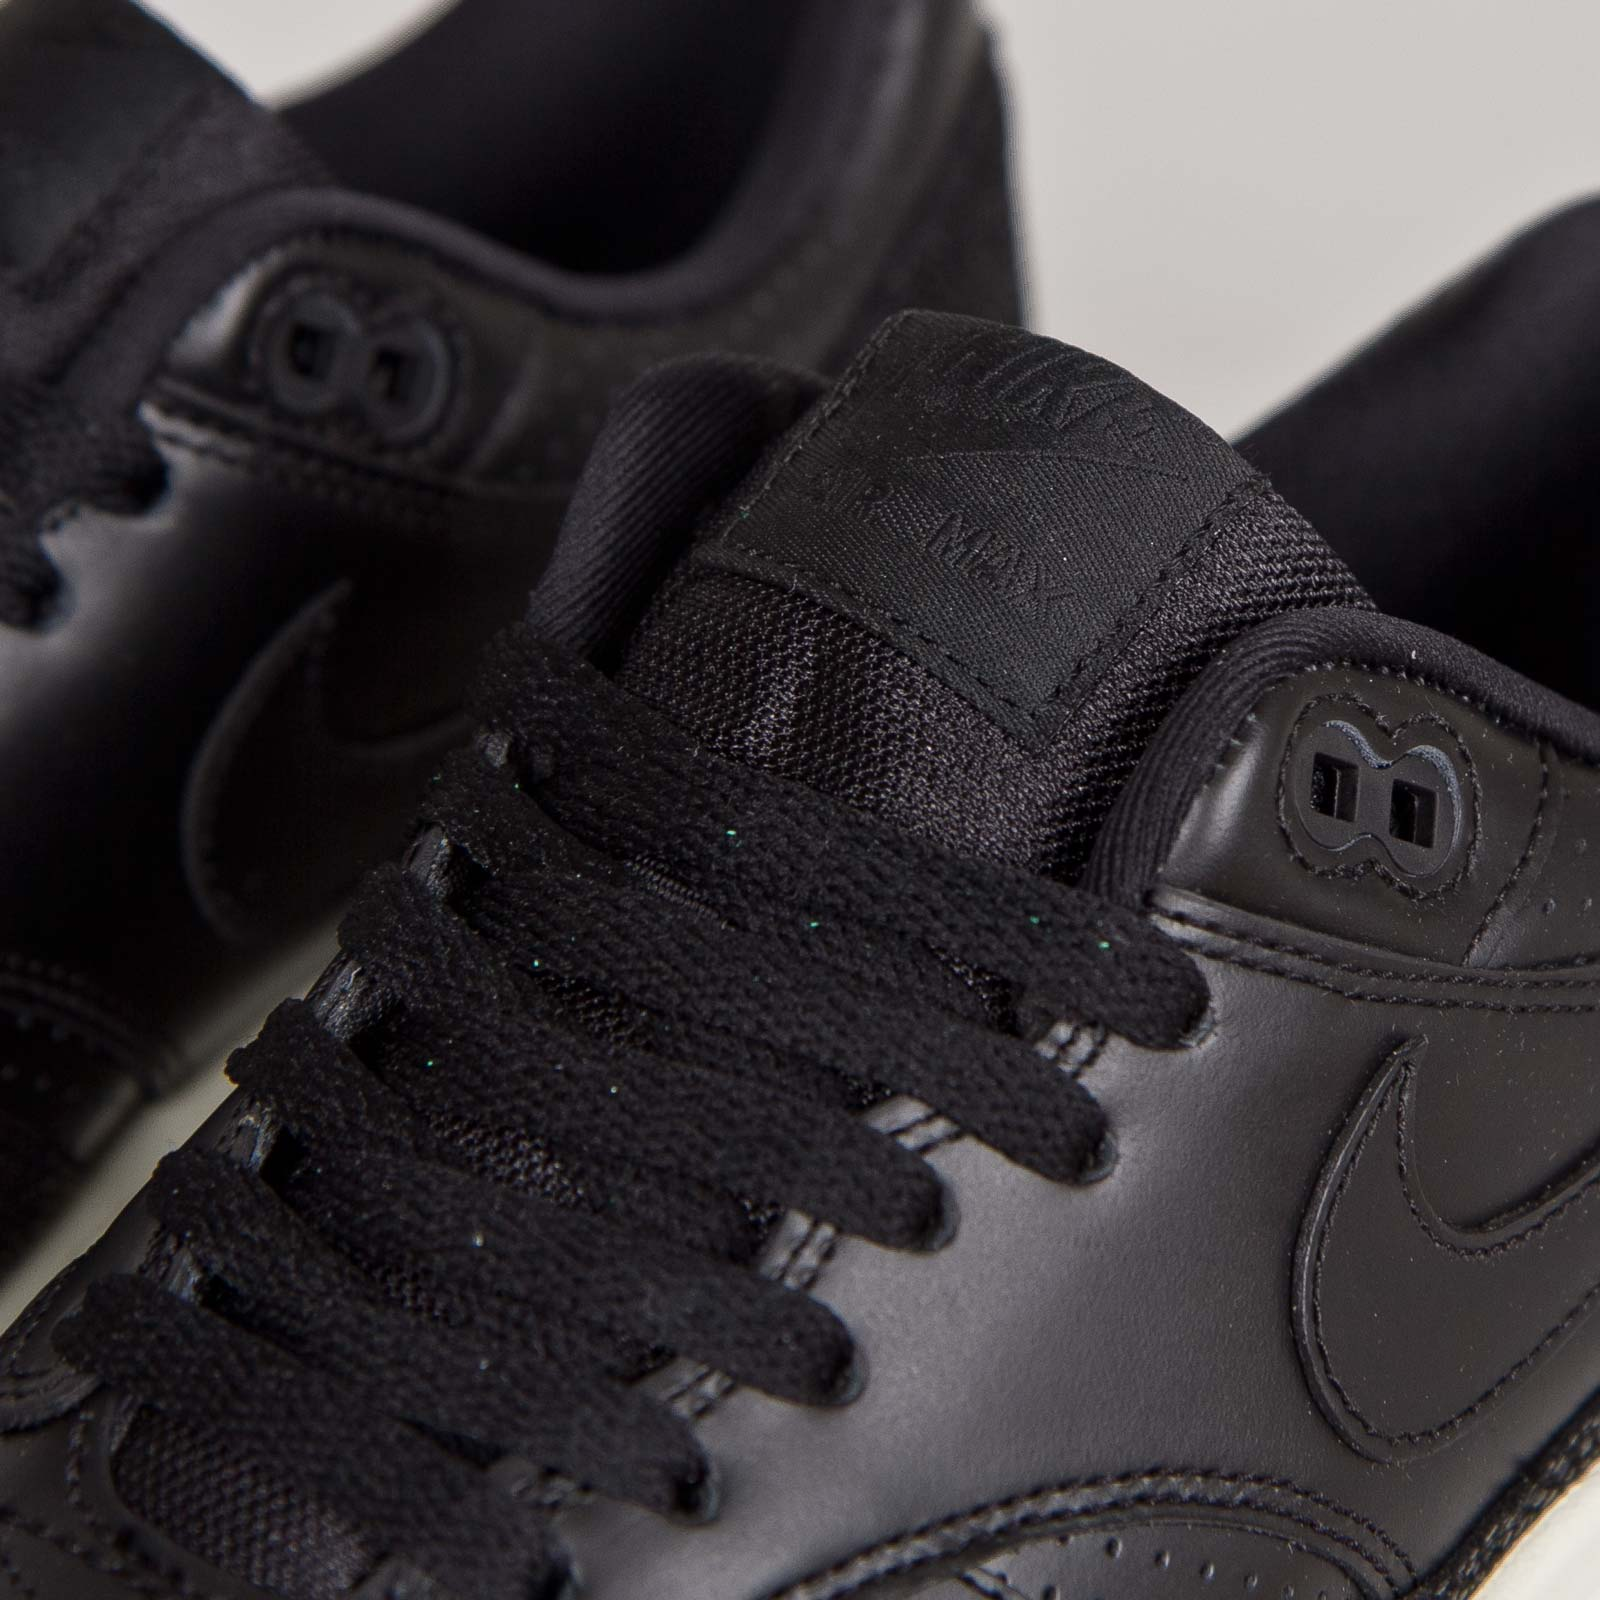 nike air max 1 pa 705007 001 sneakersnstuff scarpe di cuoio